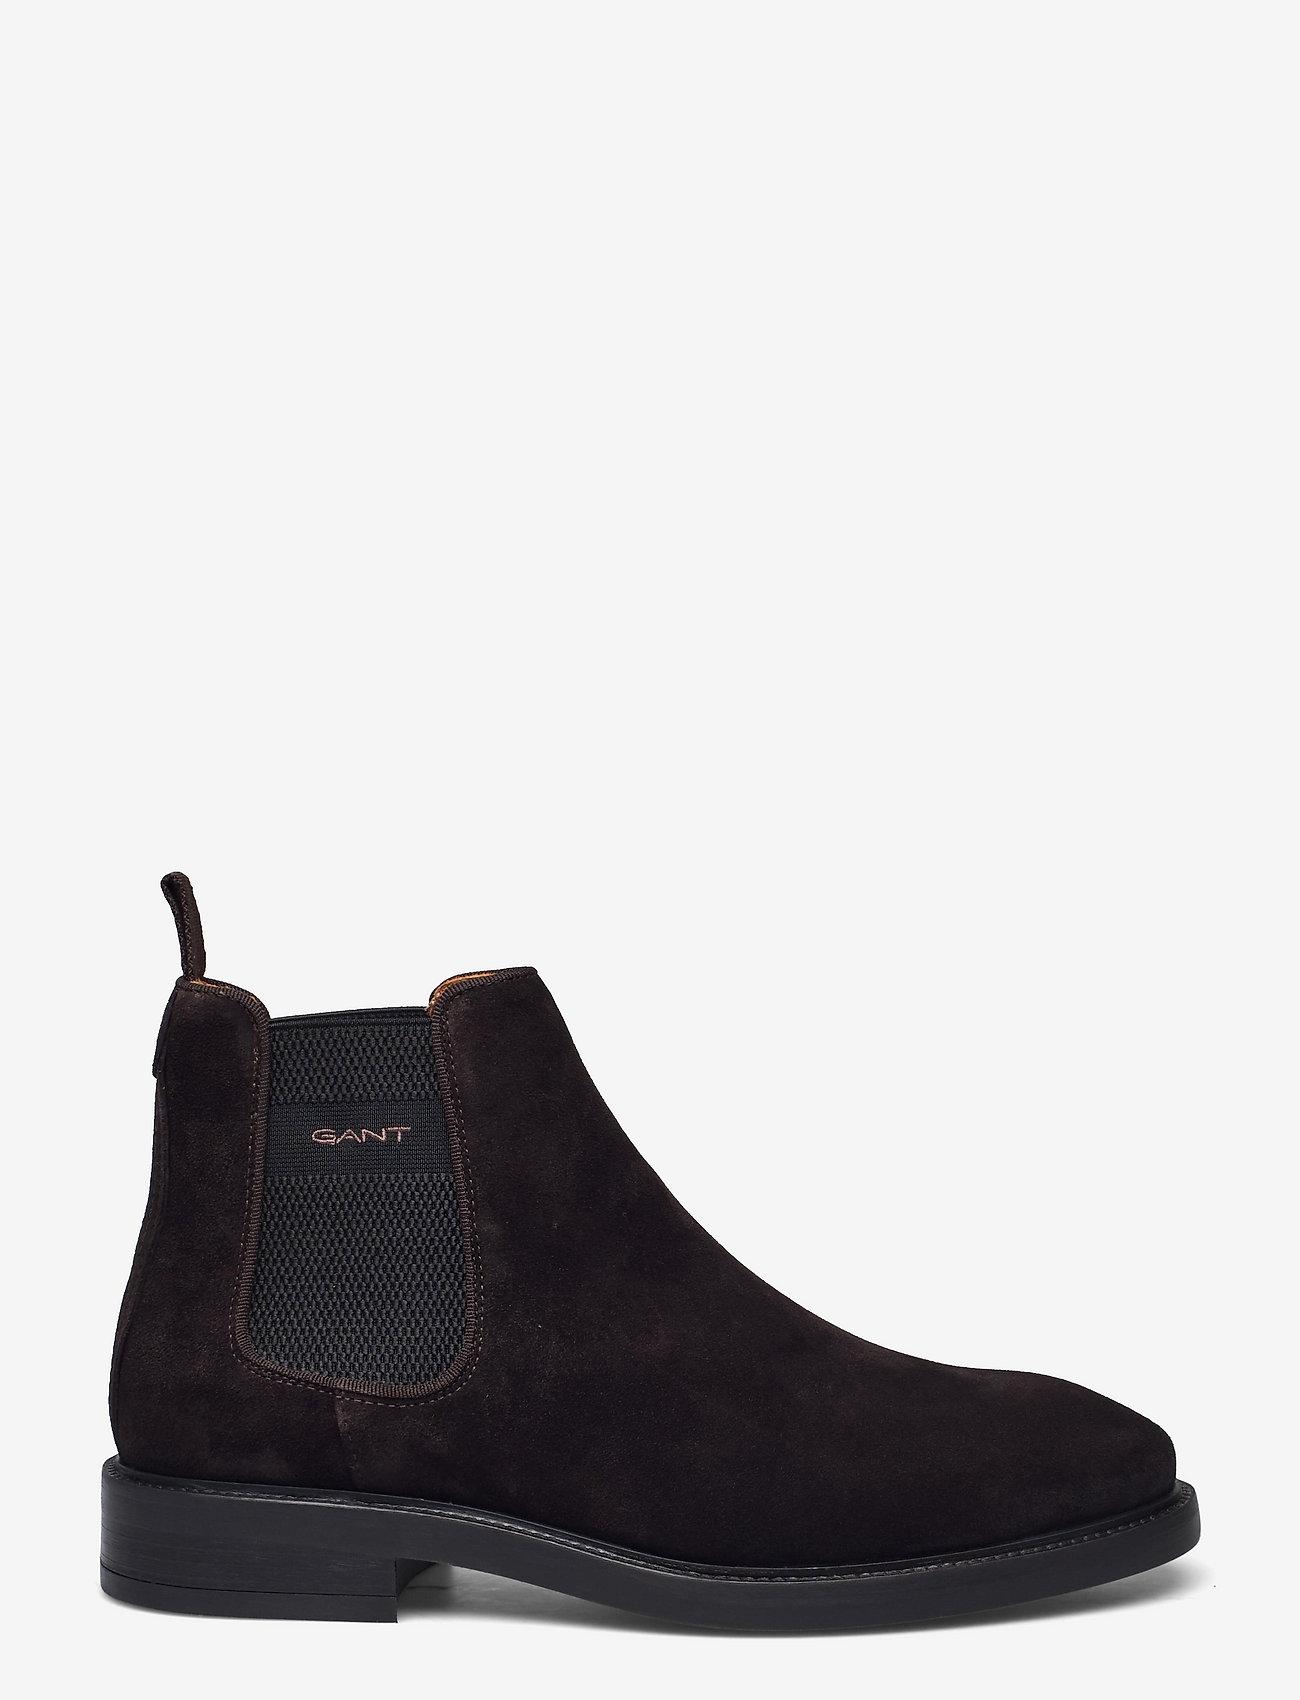 GANT - Flairville Chelsea - chelsea boots - dark brown - 1